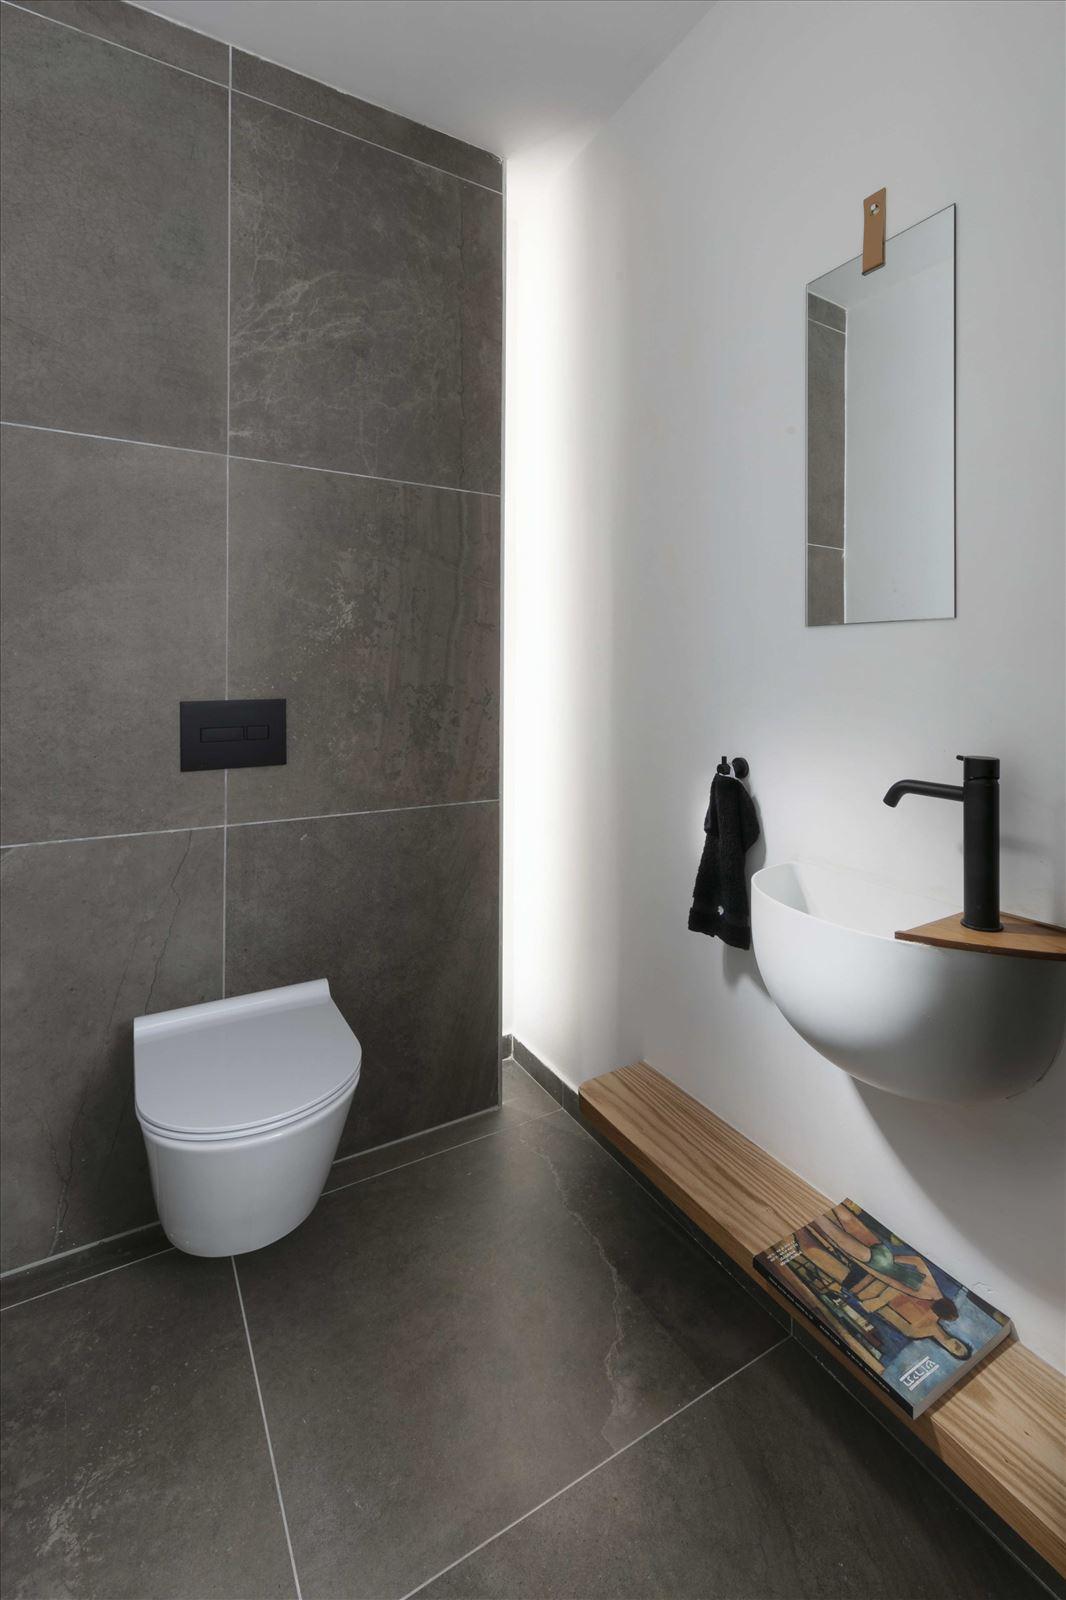 Private home - Herzliya תאורה בשירותים על ידי קמחי תאורה